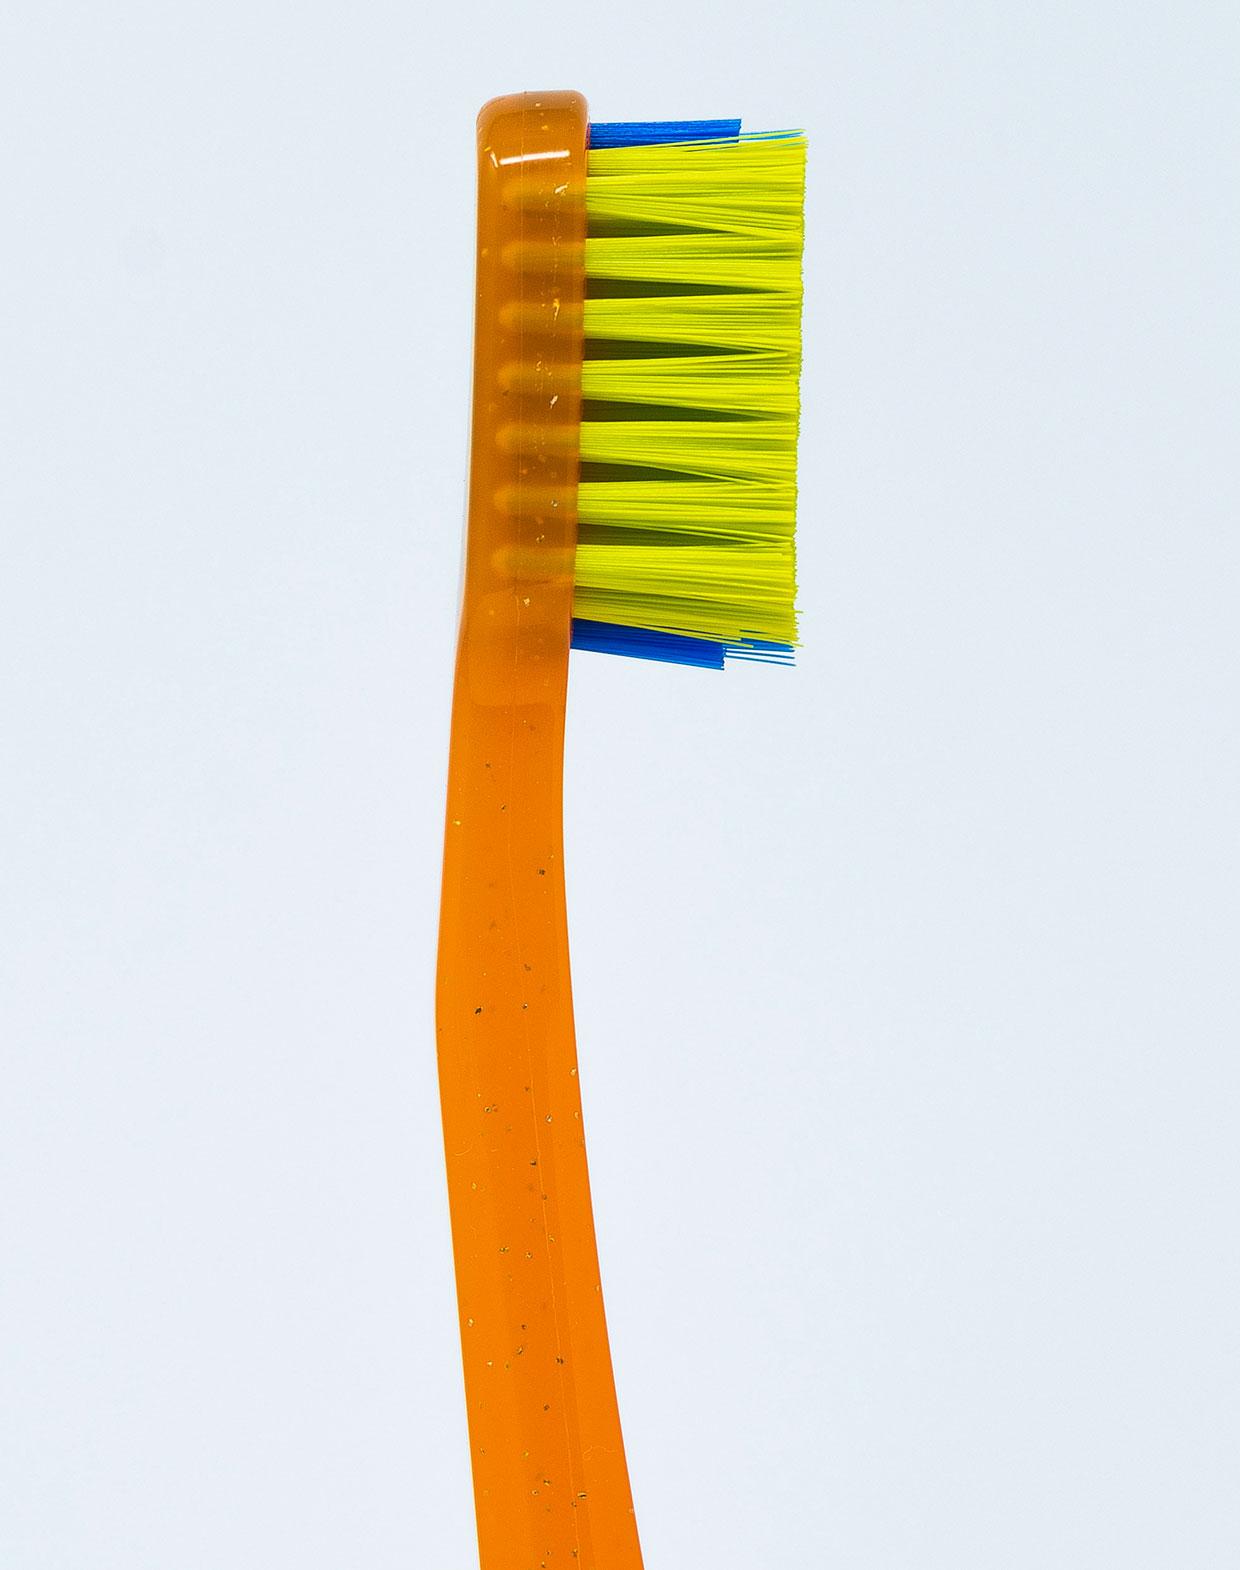 Curaprox Spazzolino Ortodontico Ortho CS 5460